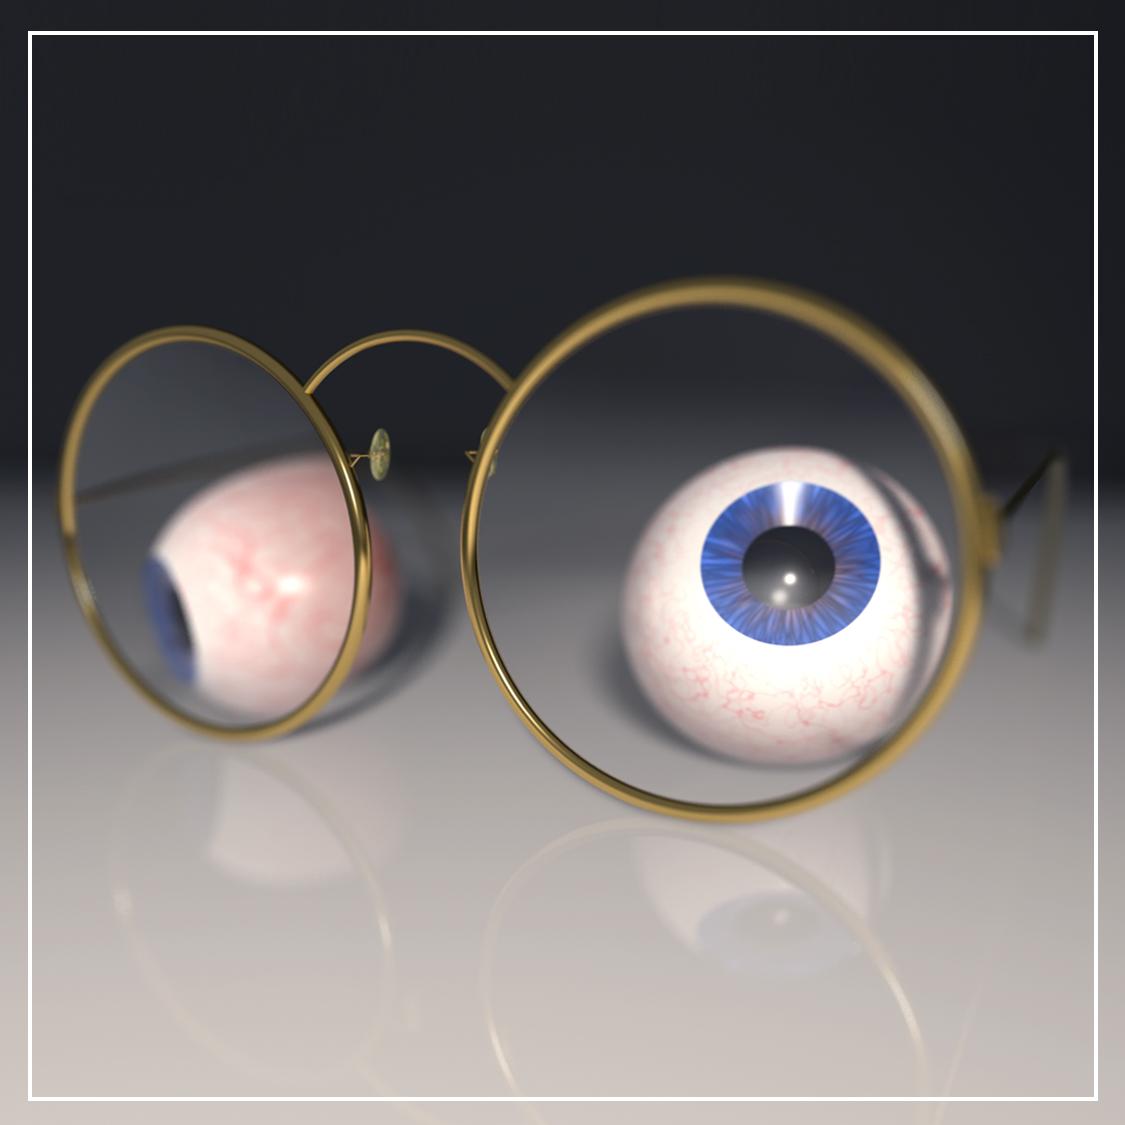 glasses_Camera_a.jpg